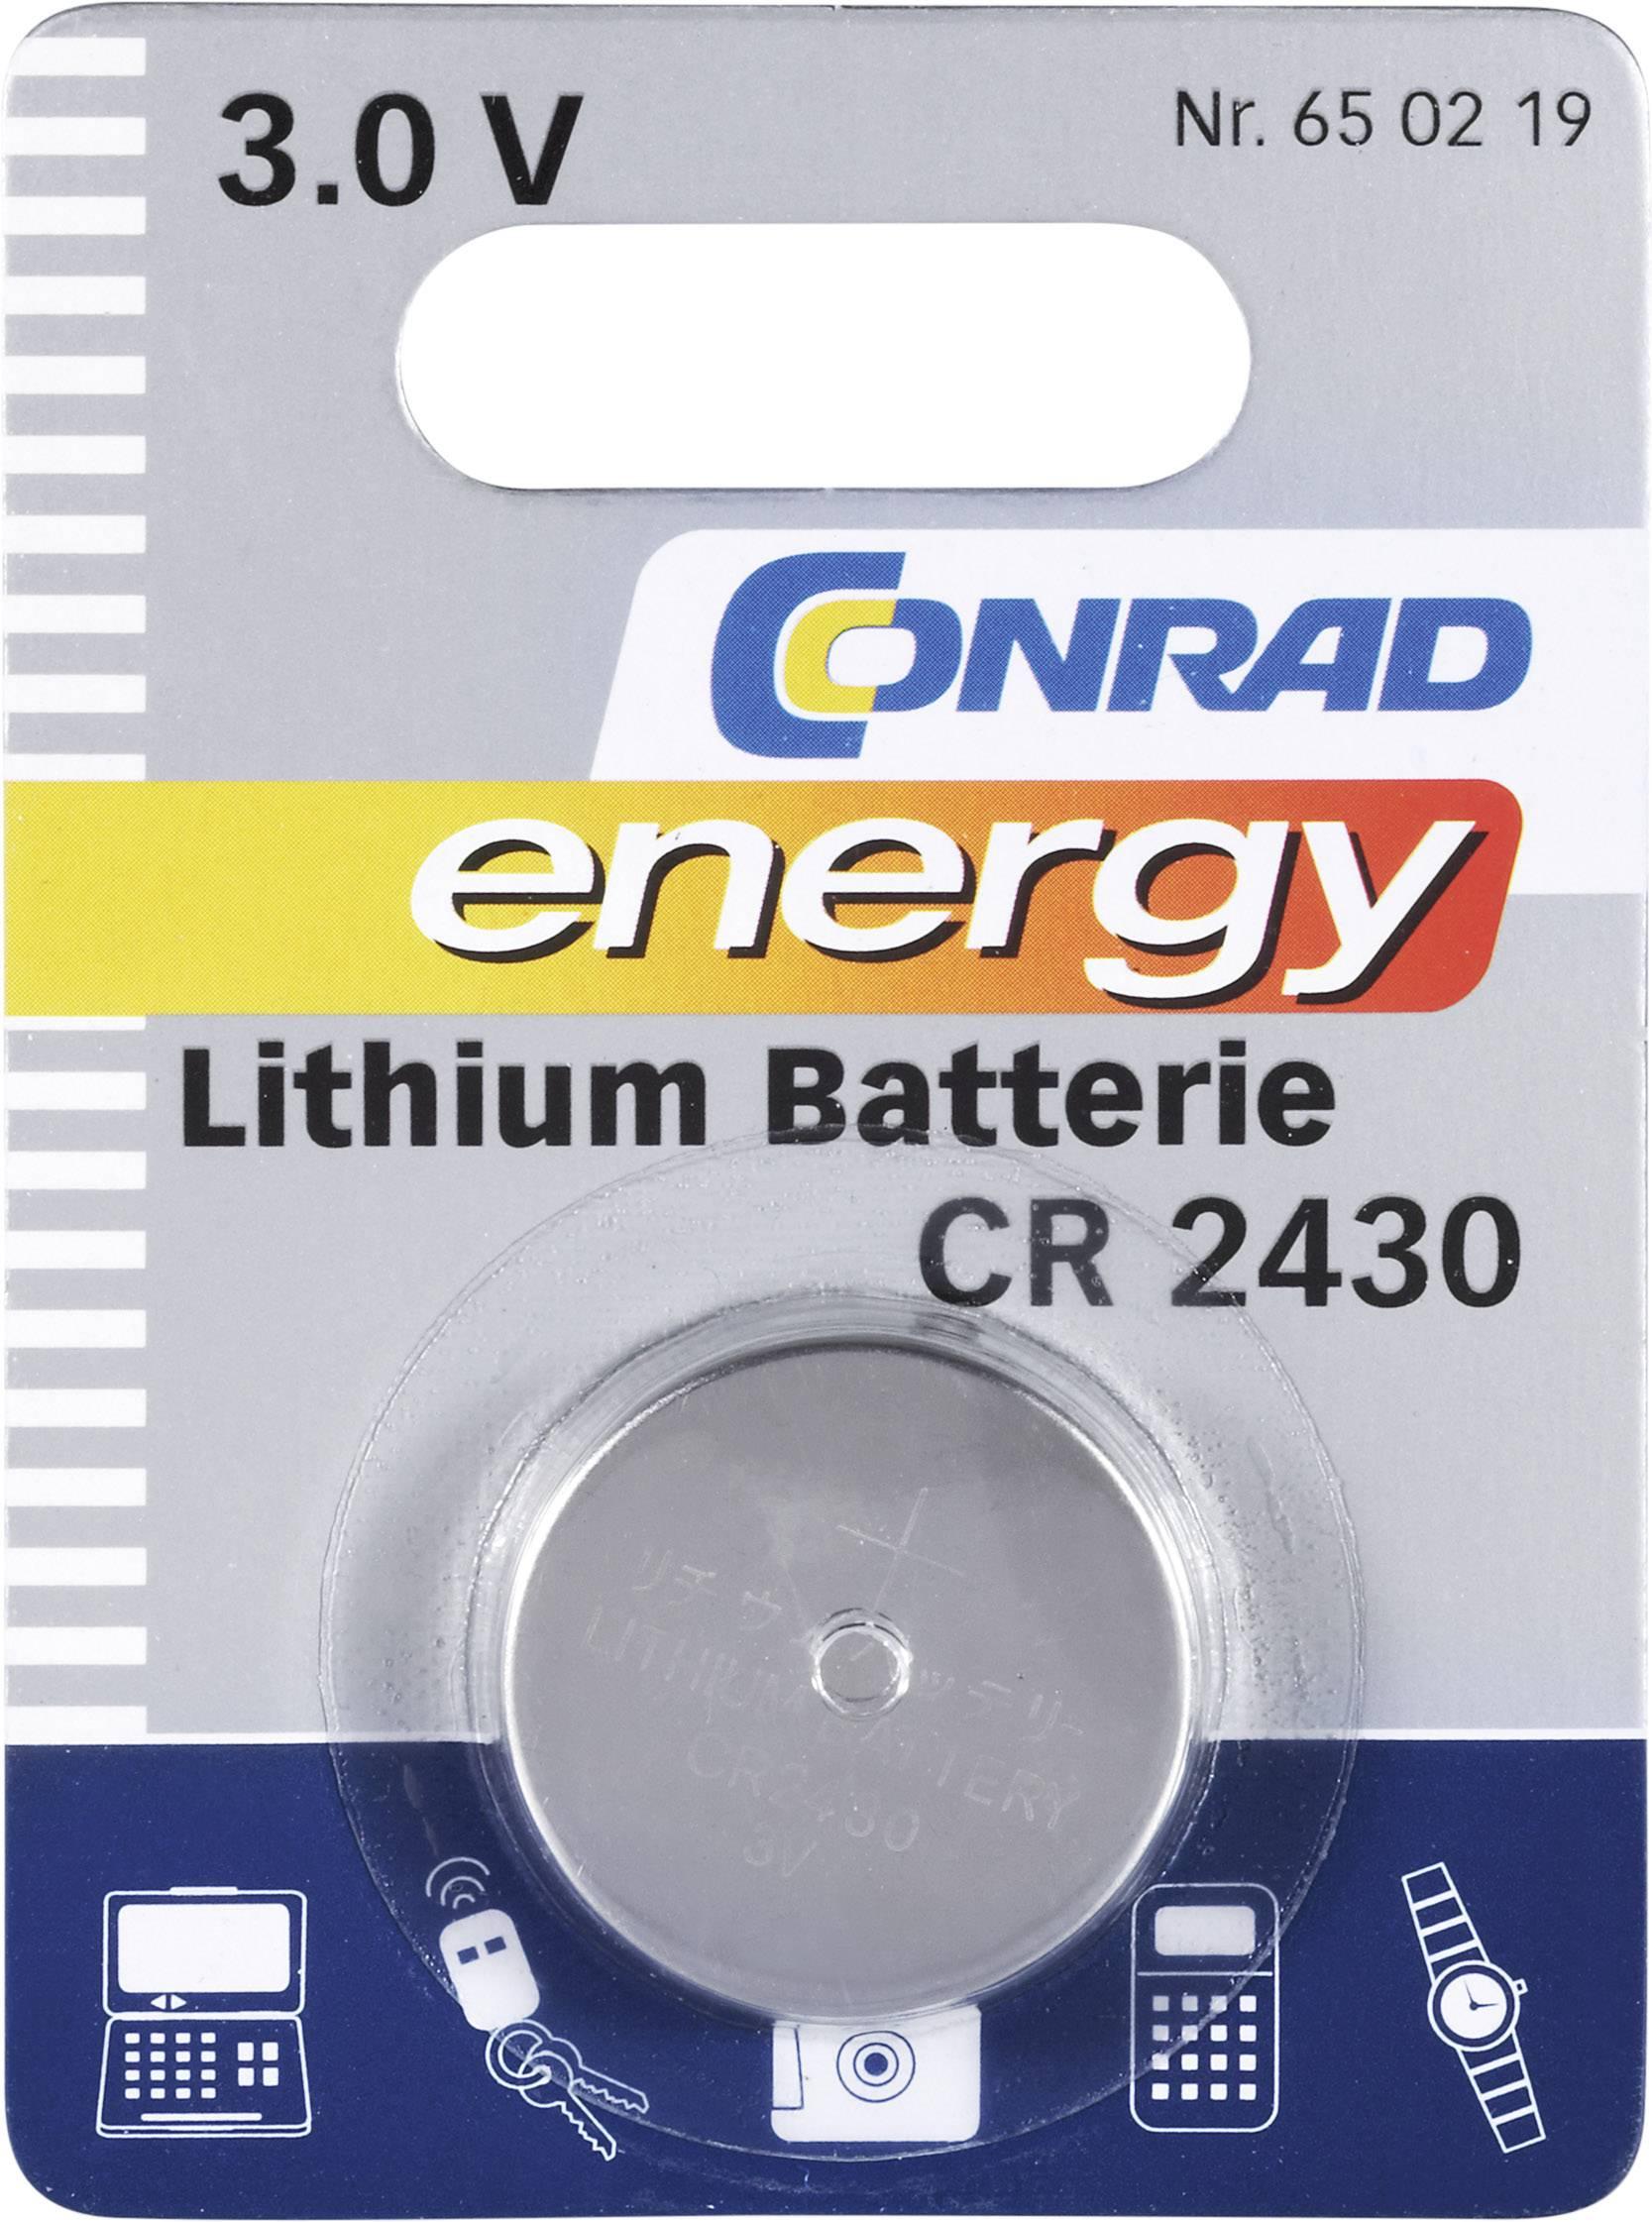 Lítiové gombíkové batérie CR 2430